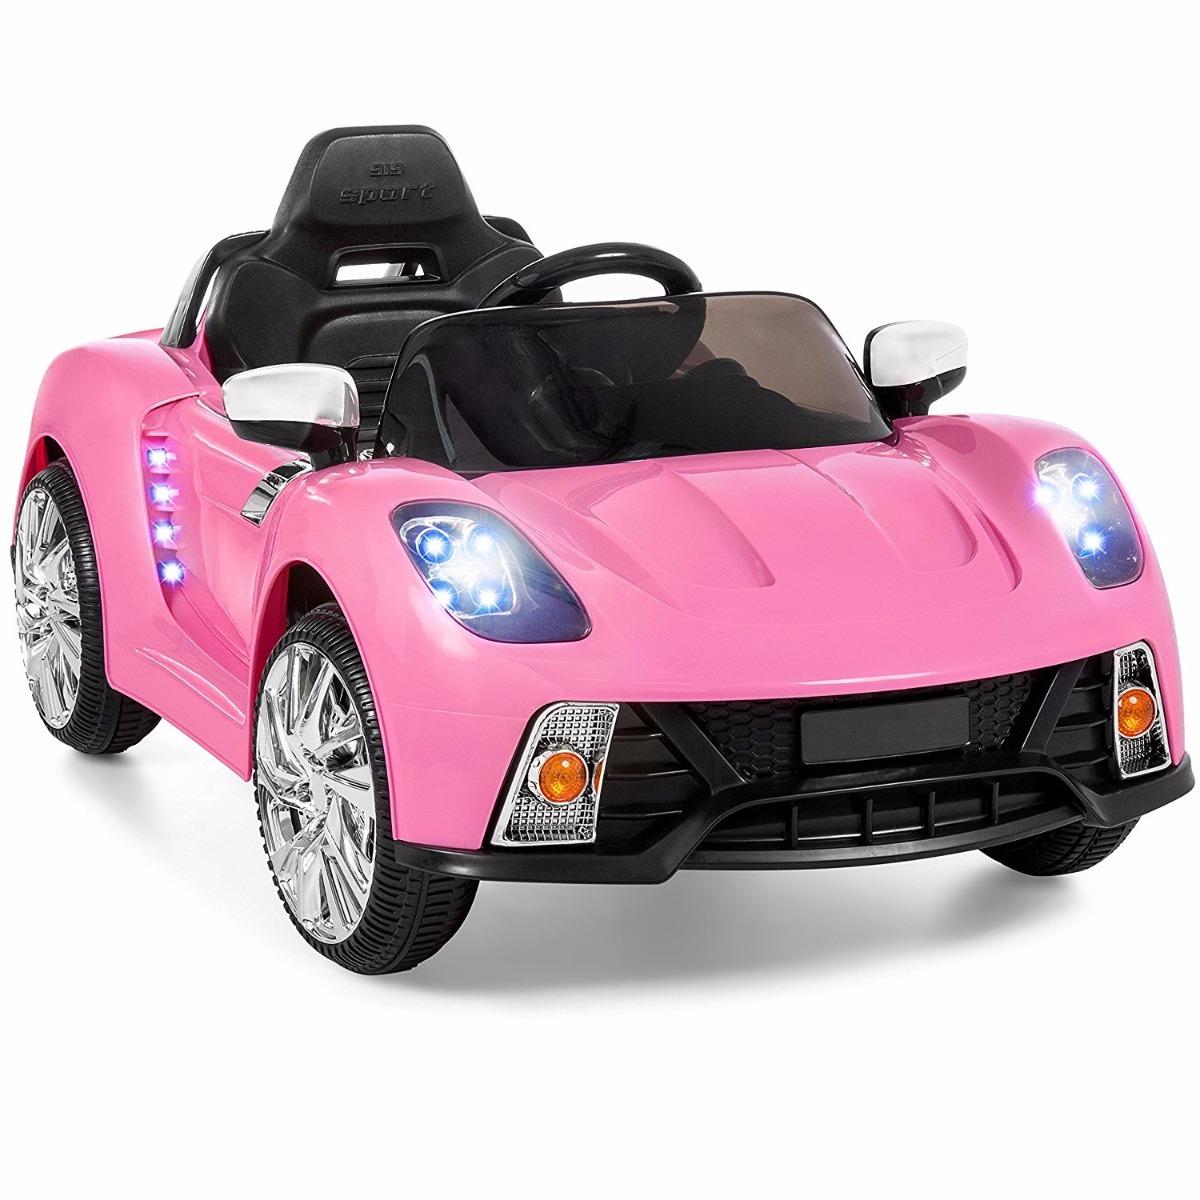 Carro De Bater 237 A El 233 Ctrica Con Mp3 Color Rosa Rosa Para